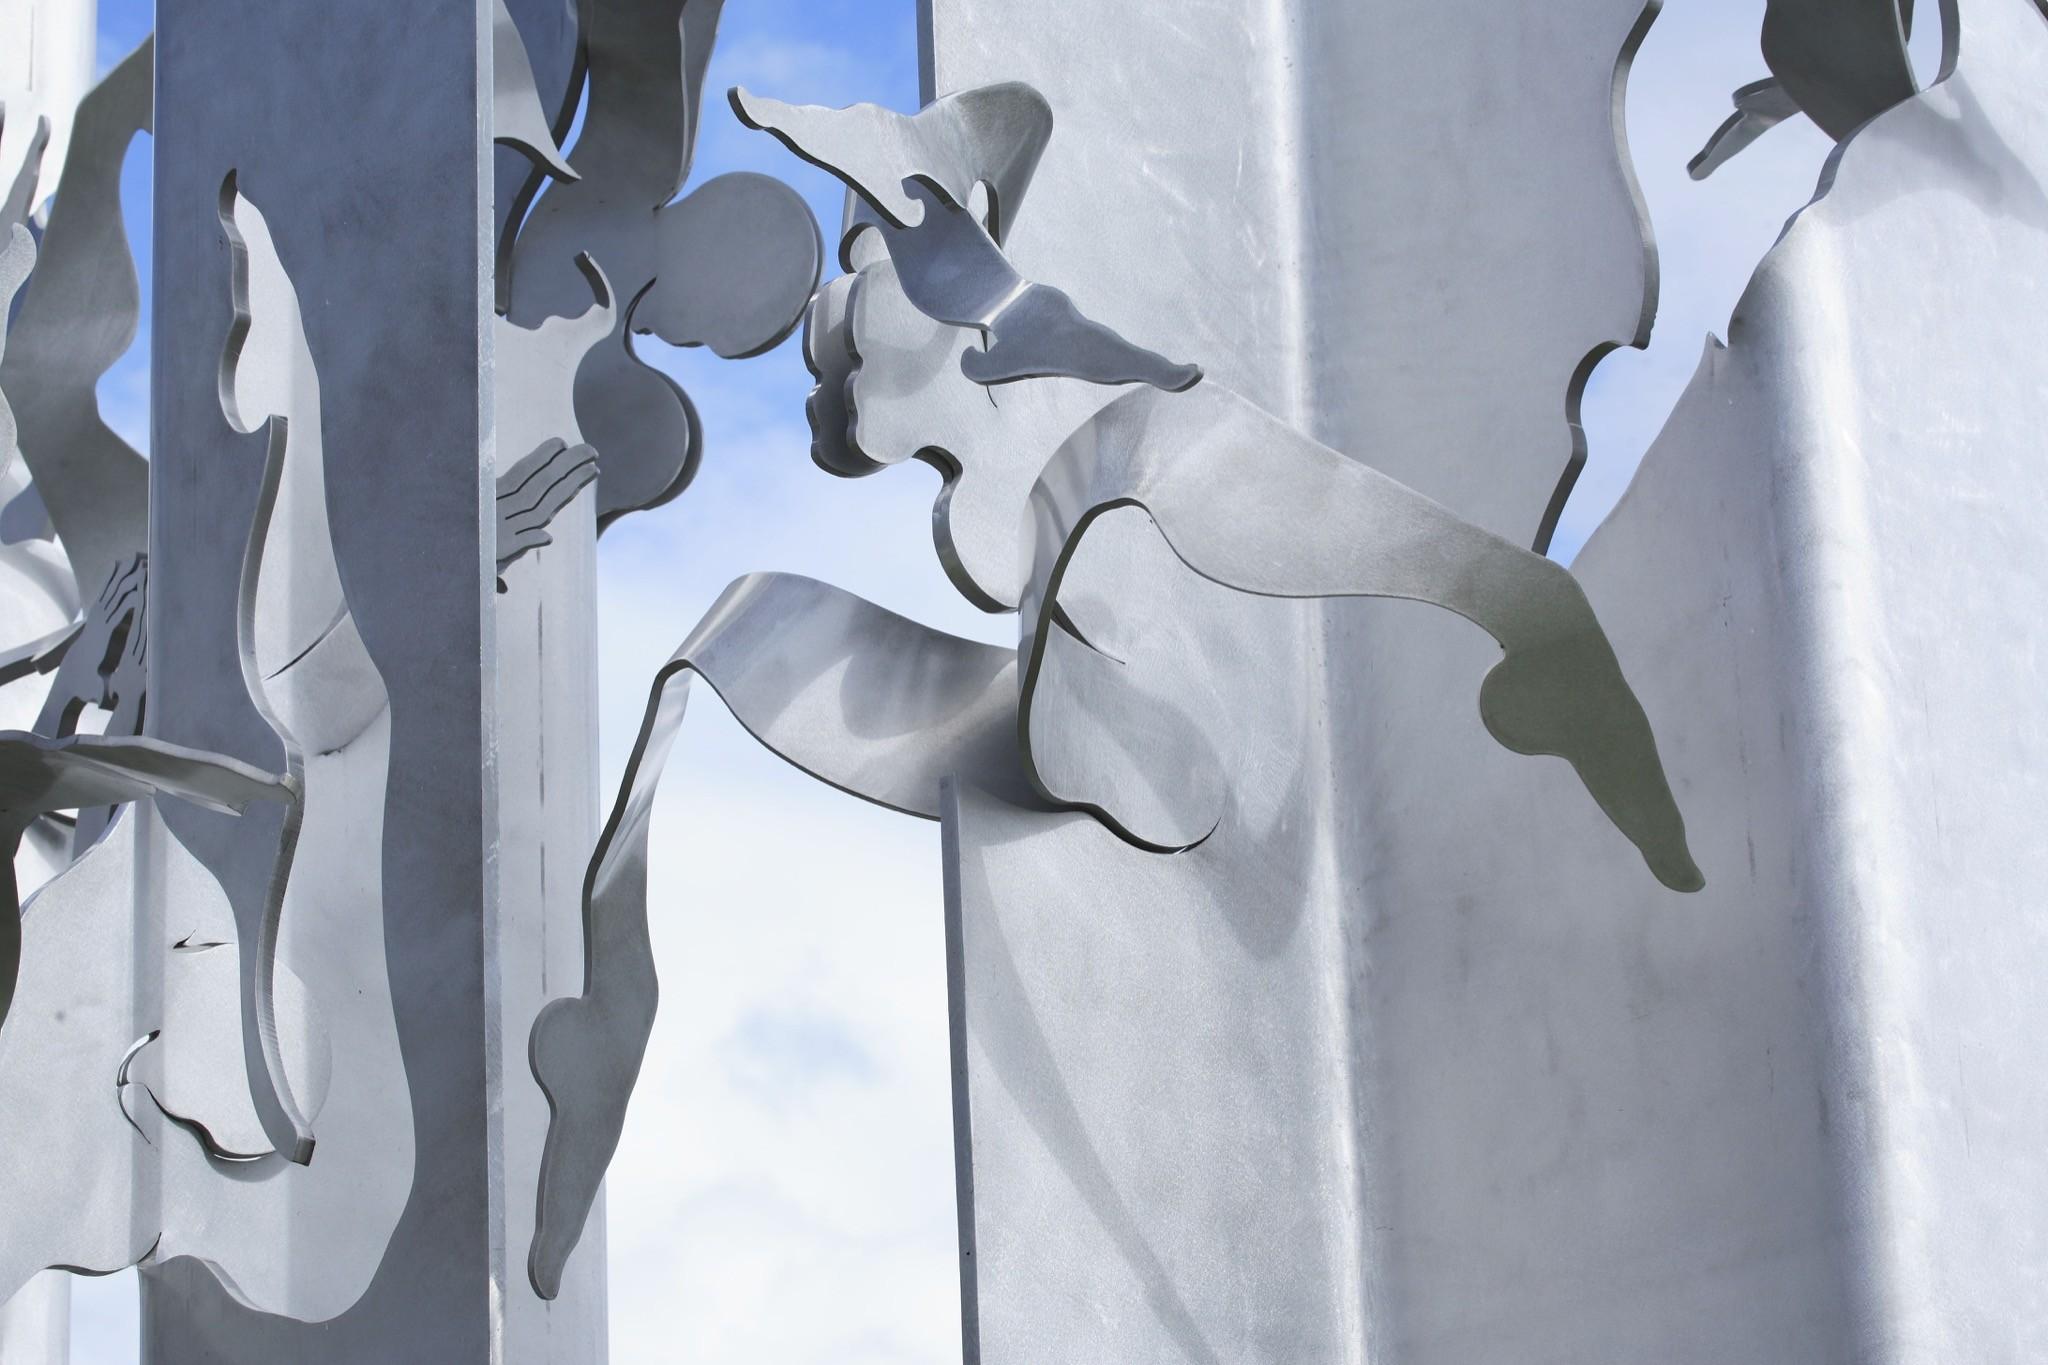 Sculpture façade Les Otimistes